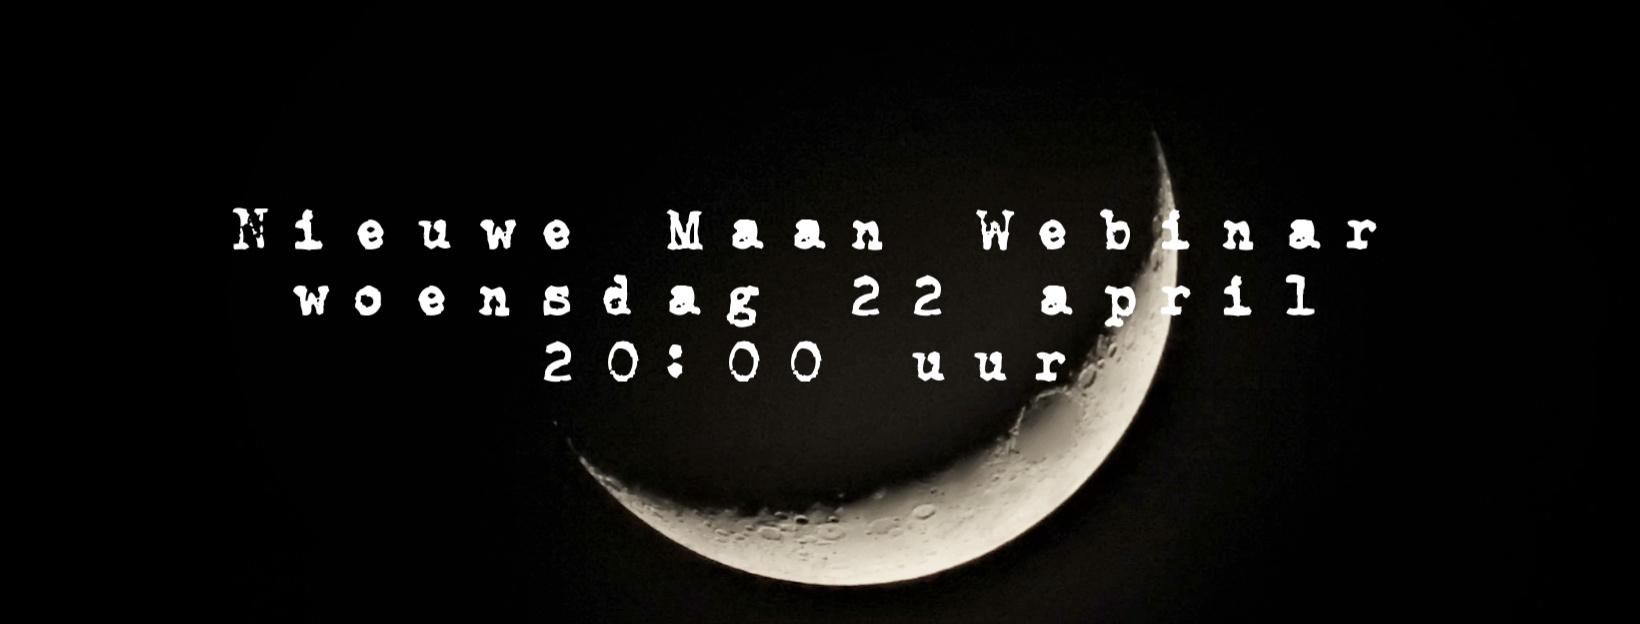 Nieuwe maan webinar